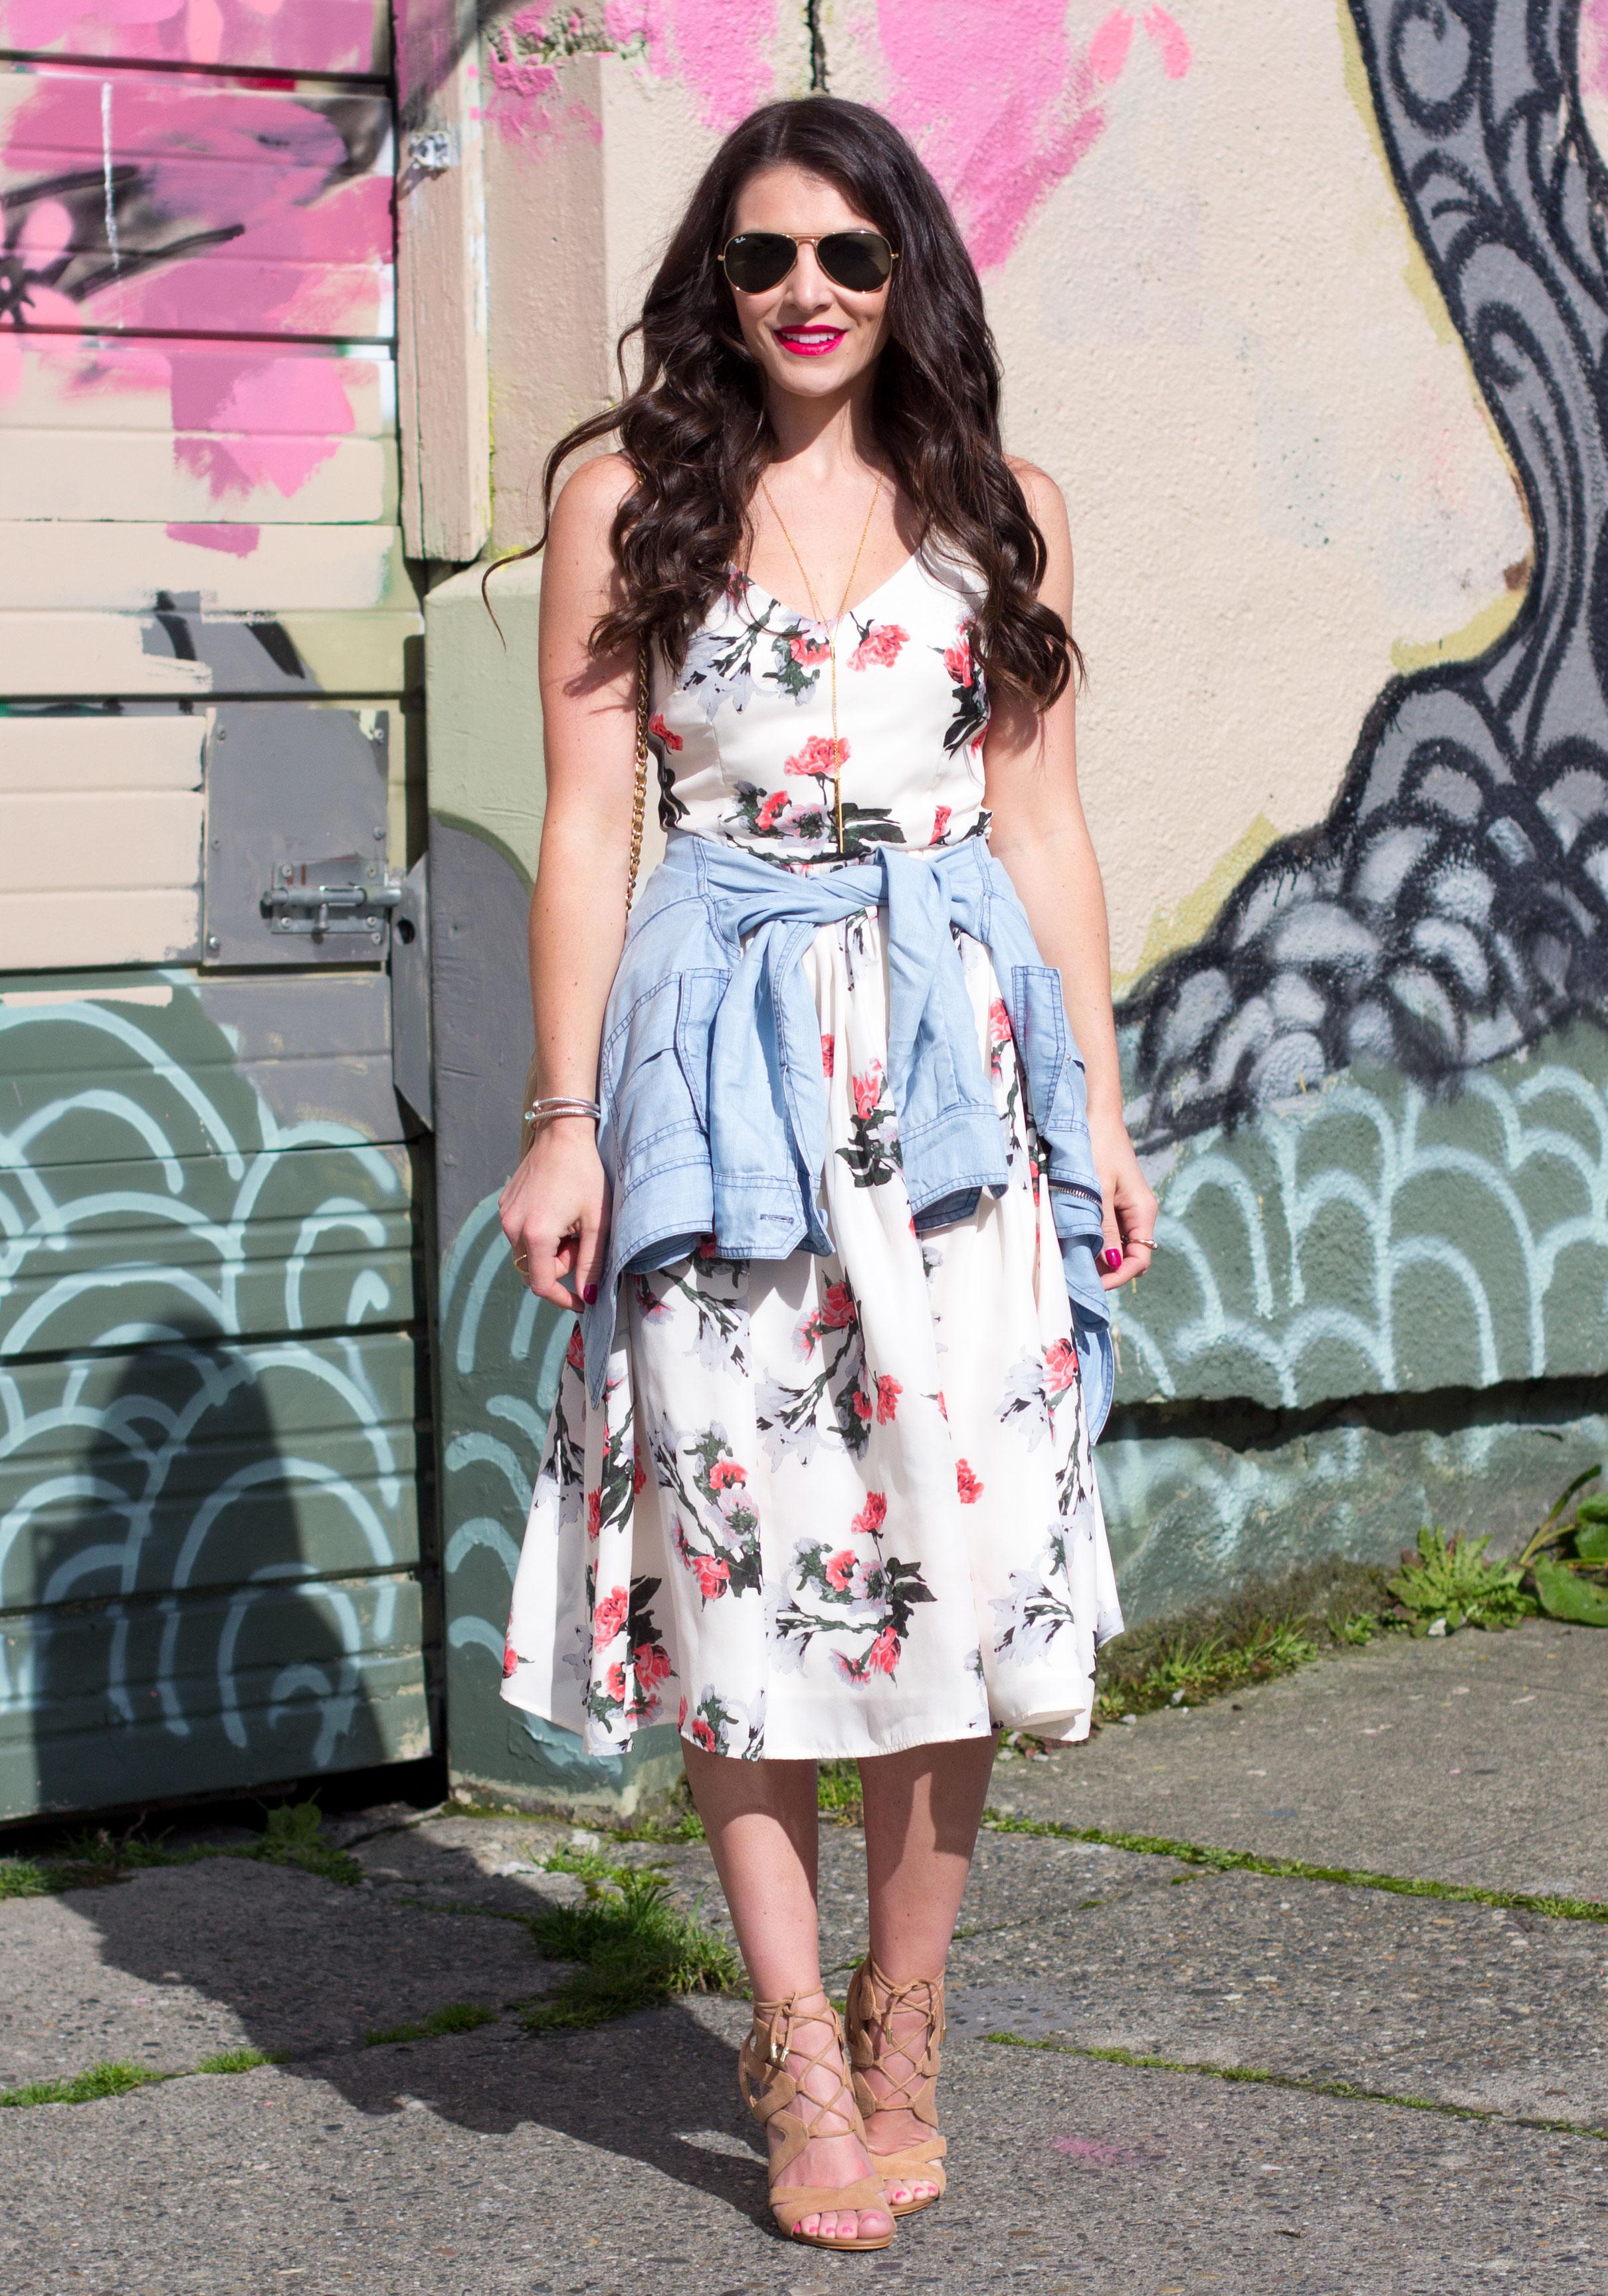 Easter Dress, BB Dakota Emeli Floral Print Midi Dress & Romy Jacket, Sam Edelman Yardley Sandals, Vintage Chanel Bag